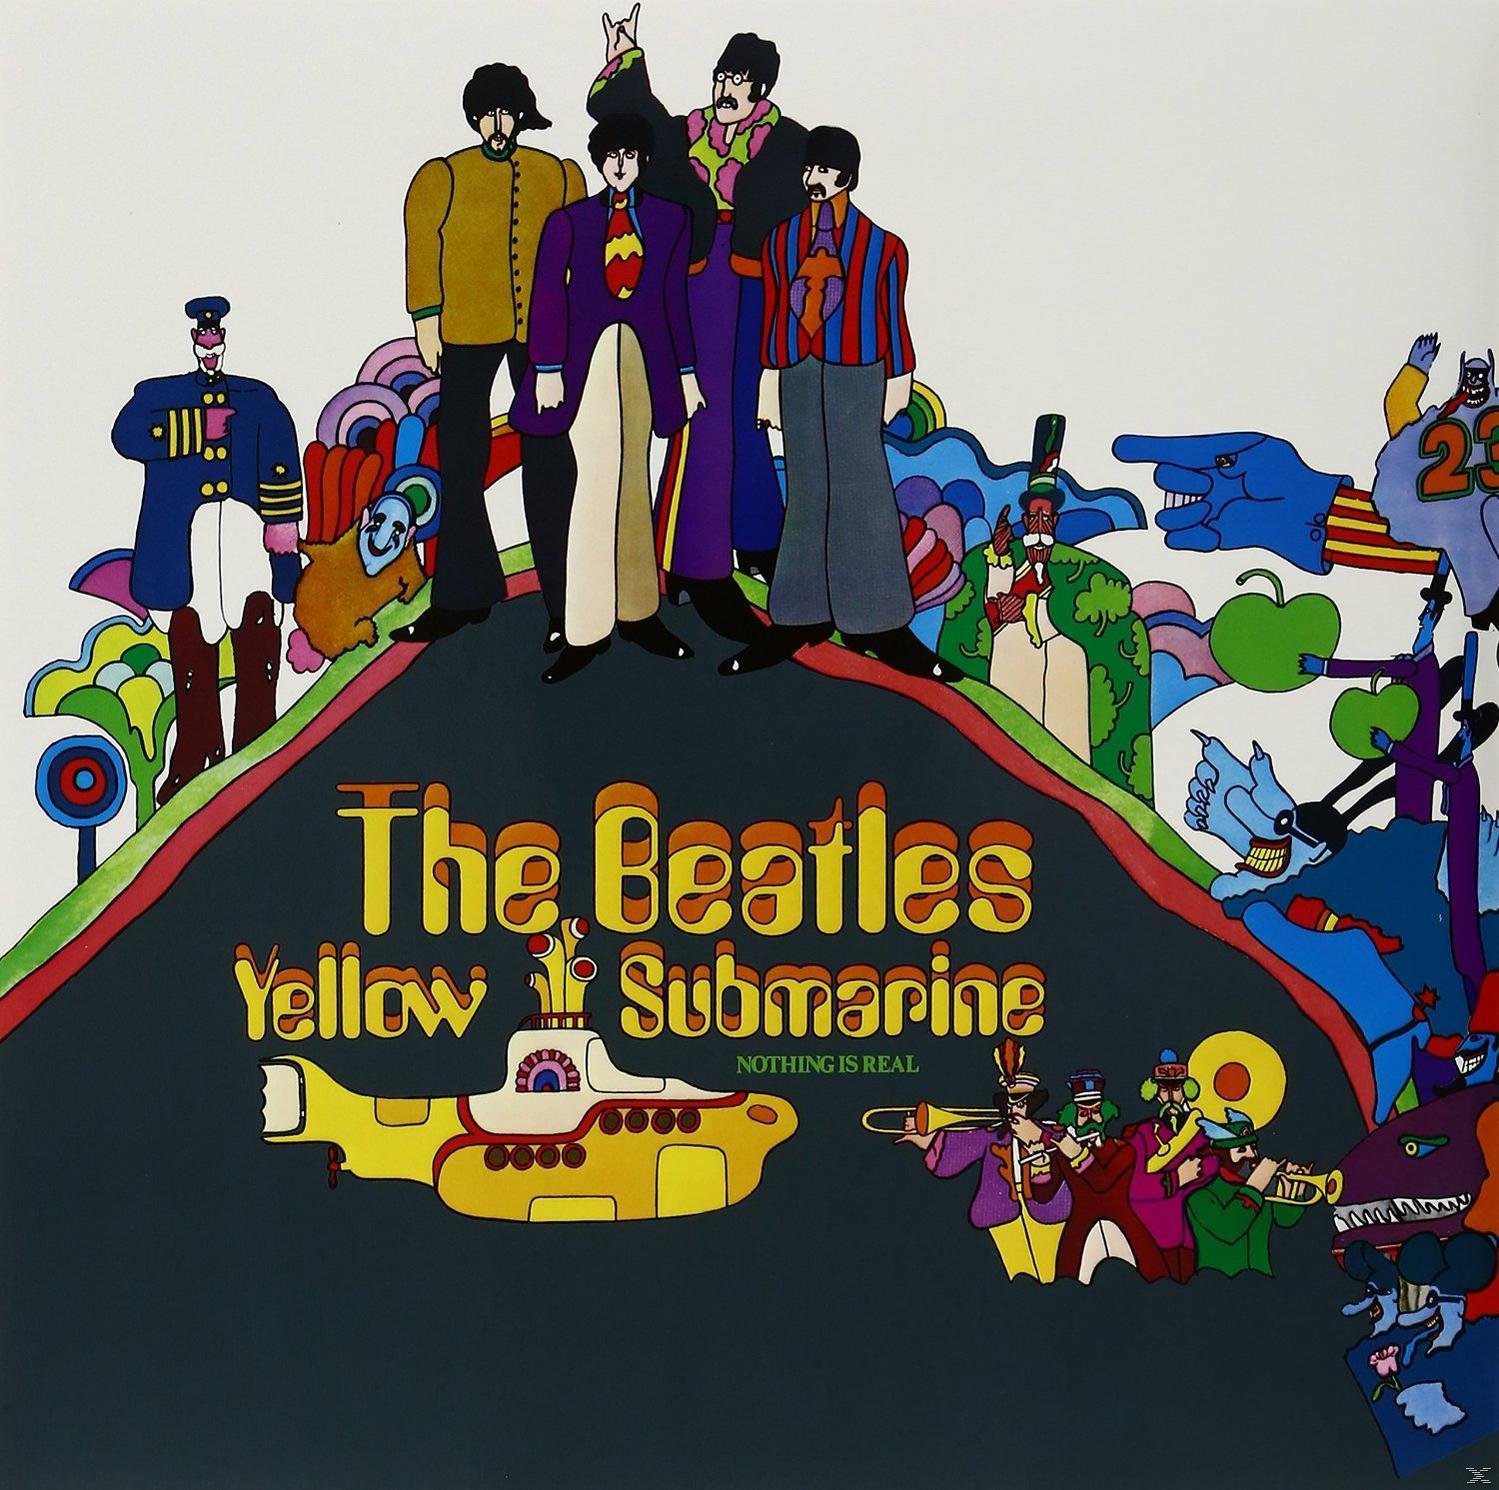 RIP George Martin: Ο 5ος Beatle έφυγε